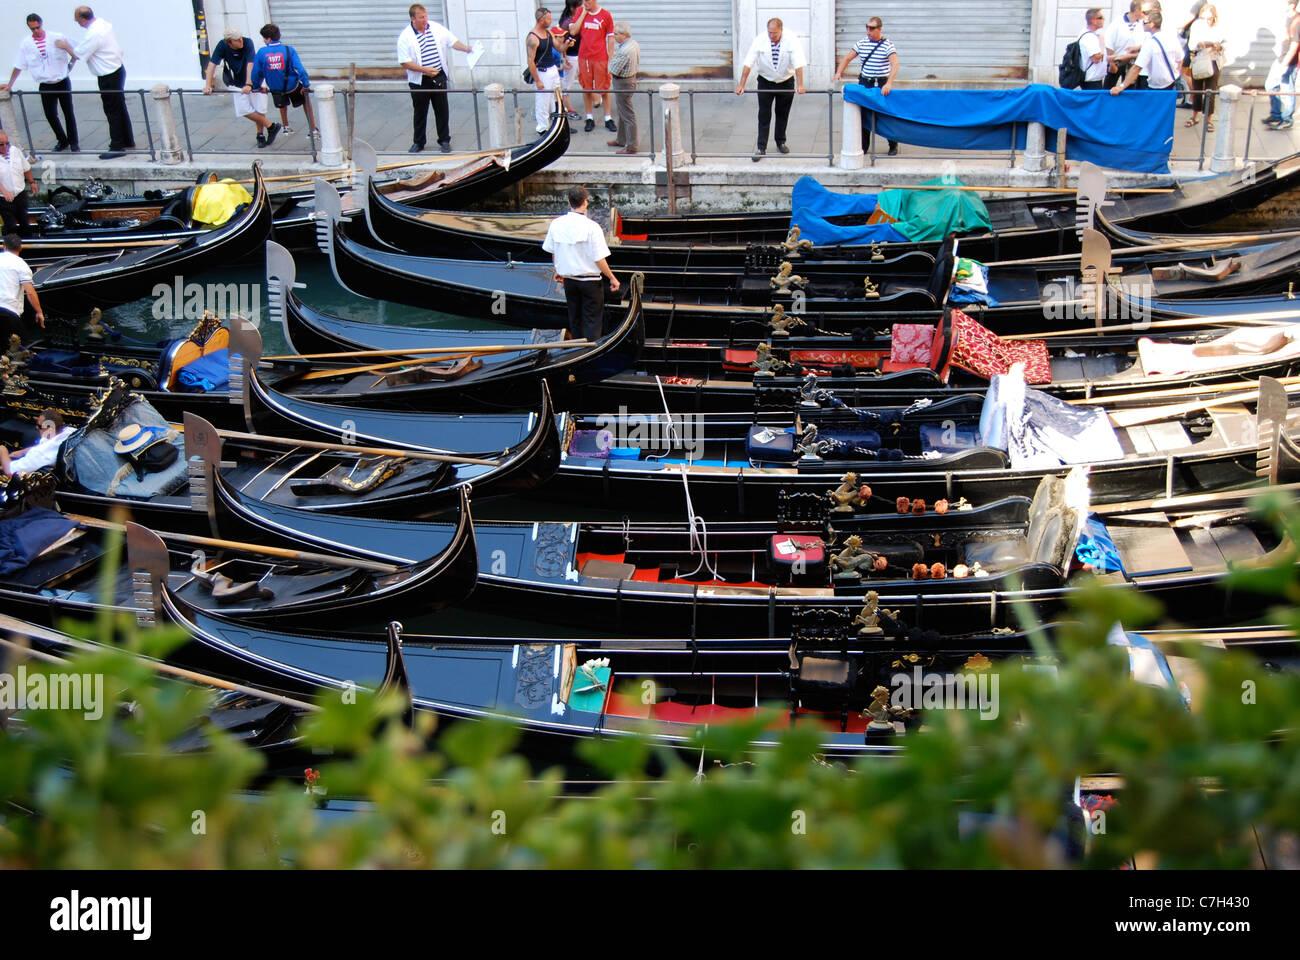 Gondolas moored at Bacino Orseolo at the start of the day - Stock Image